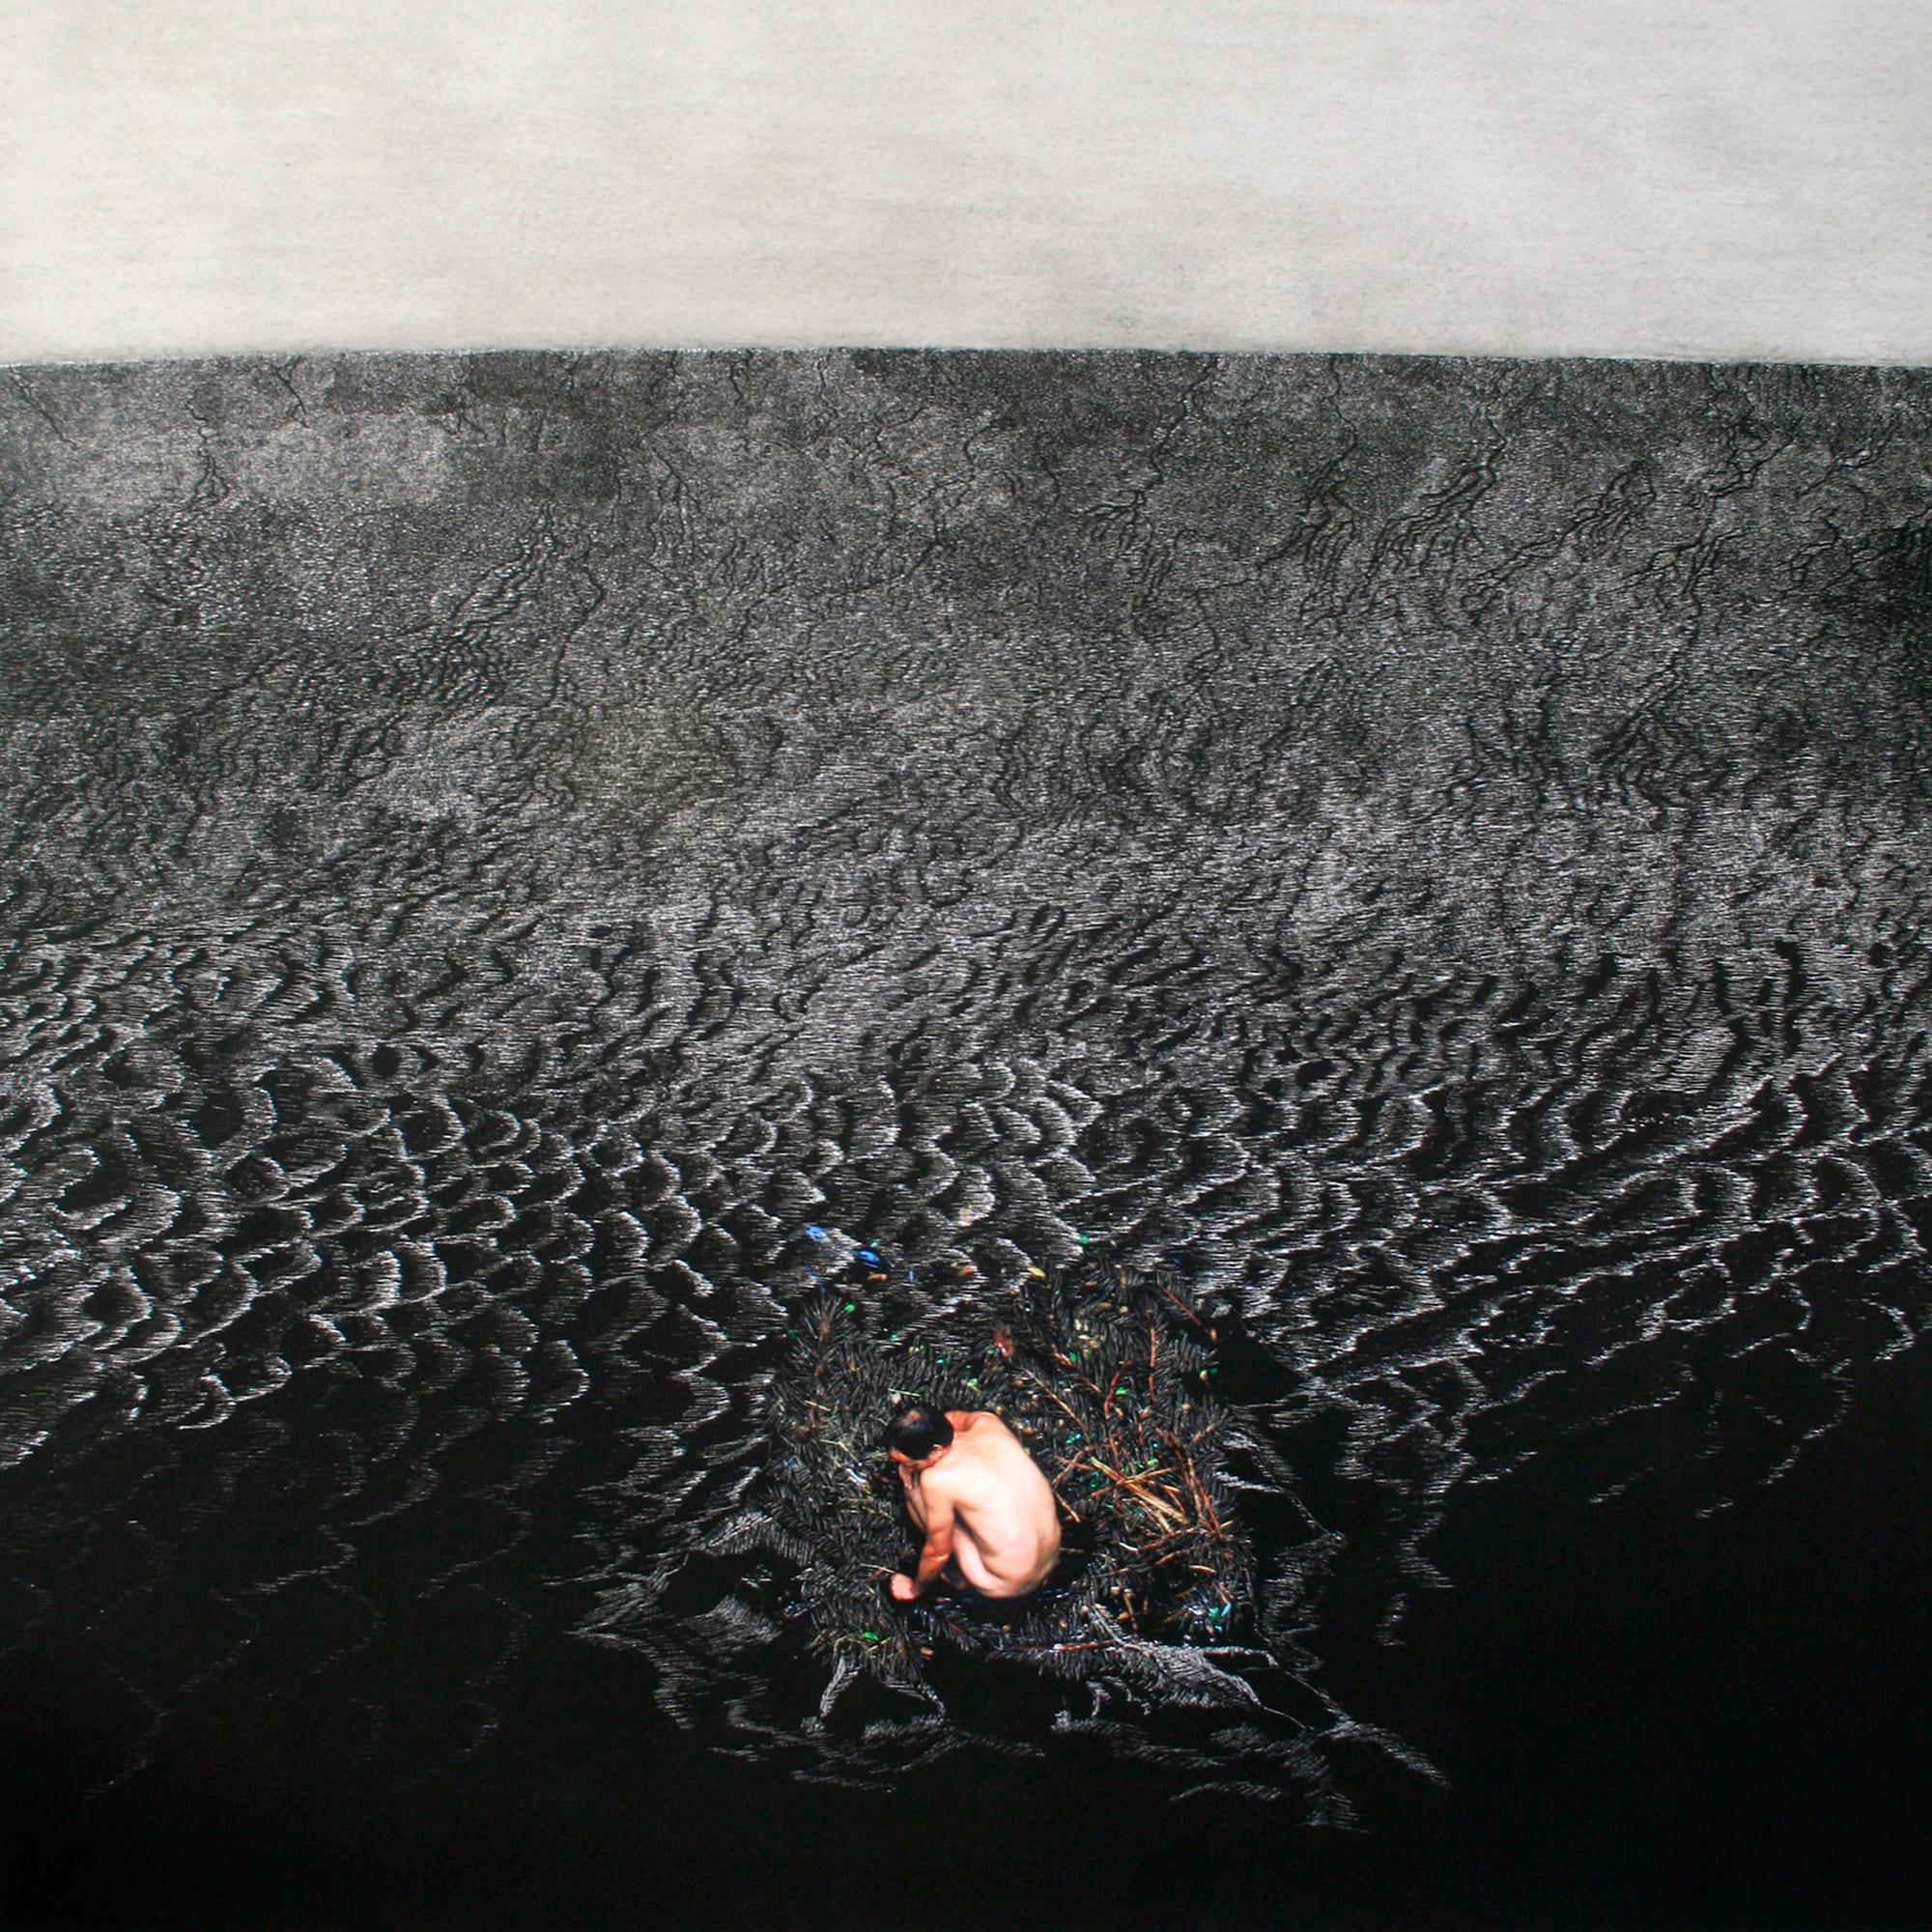 Henri van Noordenburg, Composition IX, ink on paper hand carved, 106 cm x 106 cm, 2012, Queensland Centre for Photography Collection